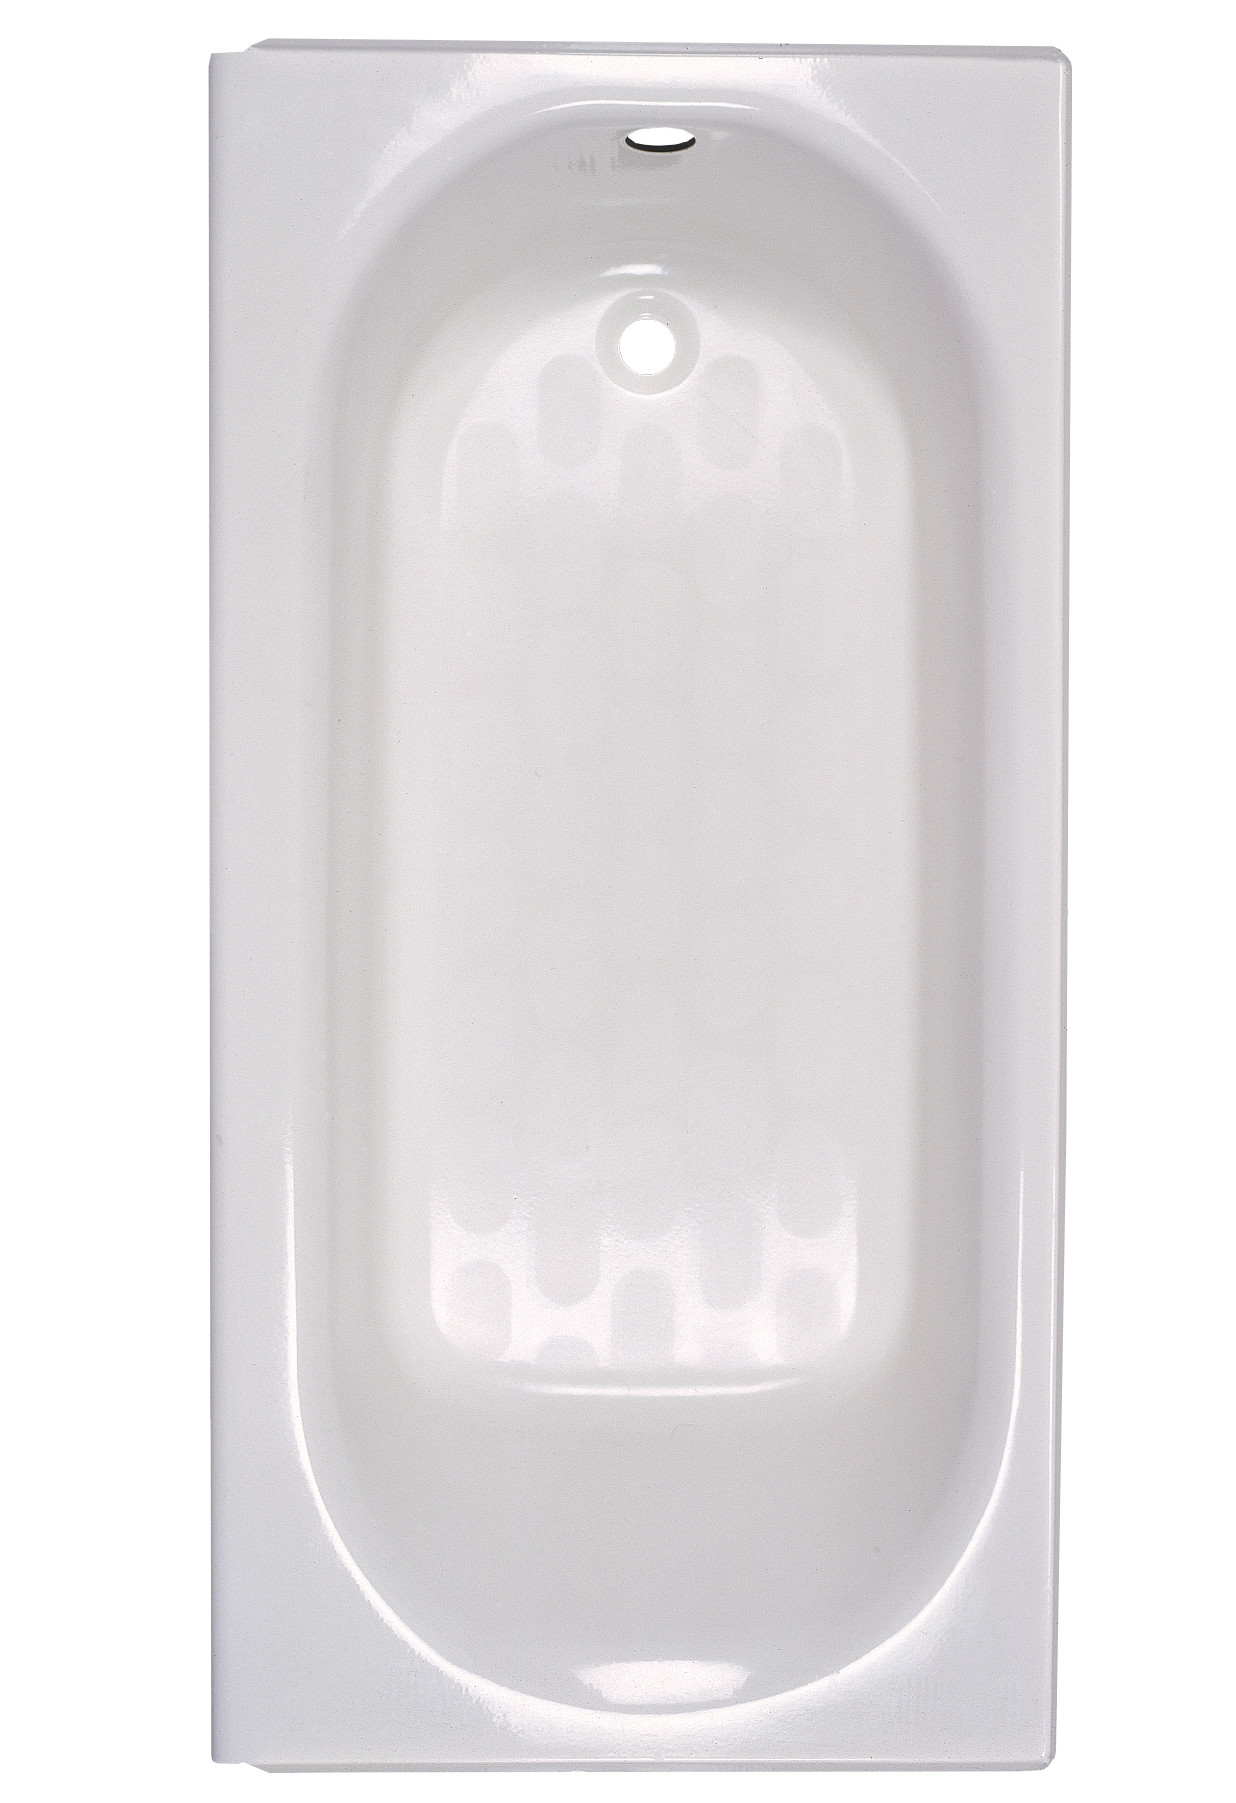 American Standard 2390202.020 Bathtub, Princeton™, Soaking, Rectangular Shape, 60 in L x 30 in W, Left Drain, Glossy White, Domestic